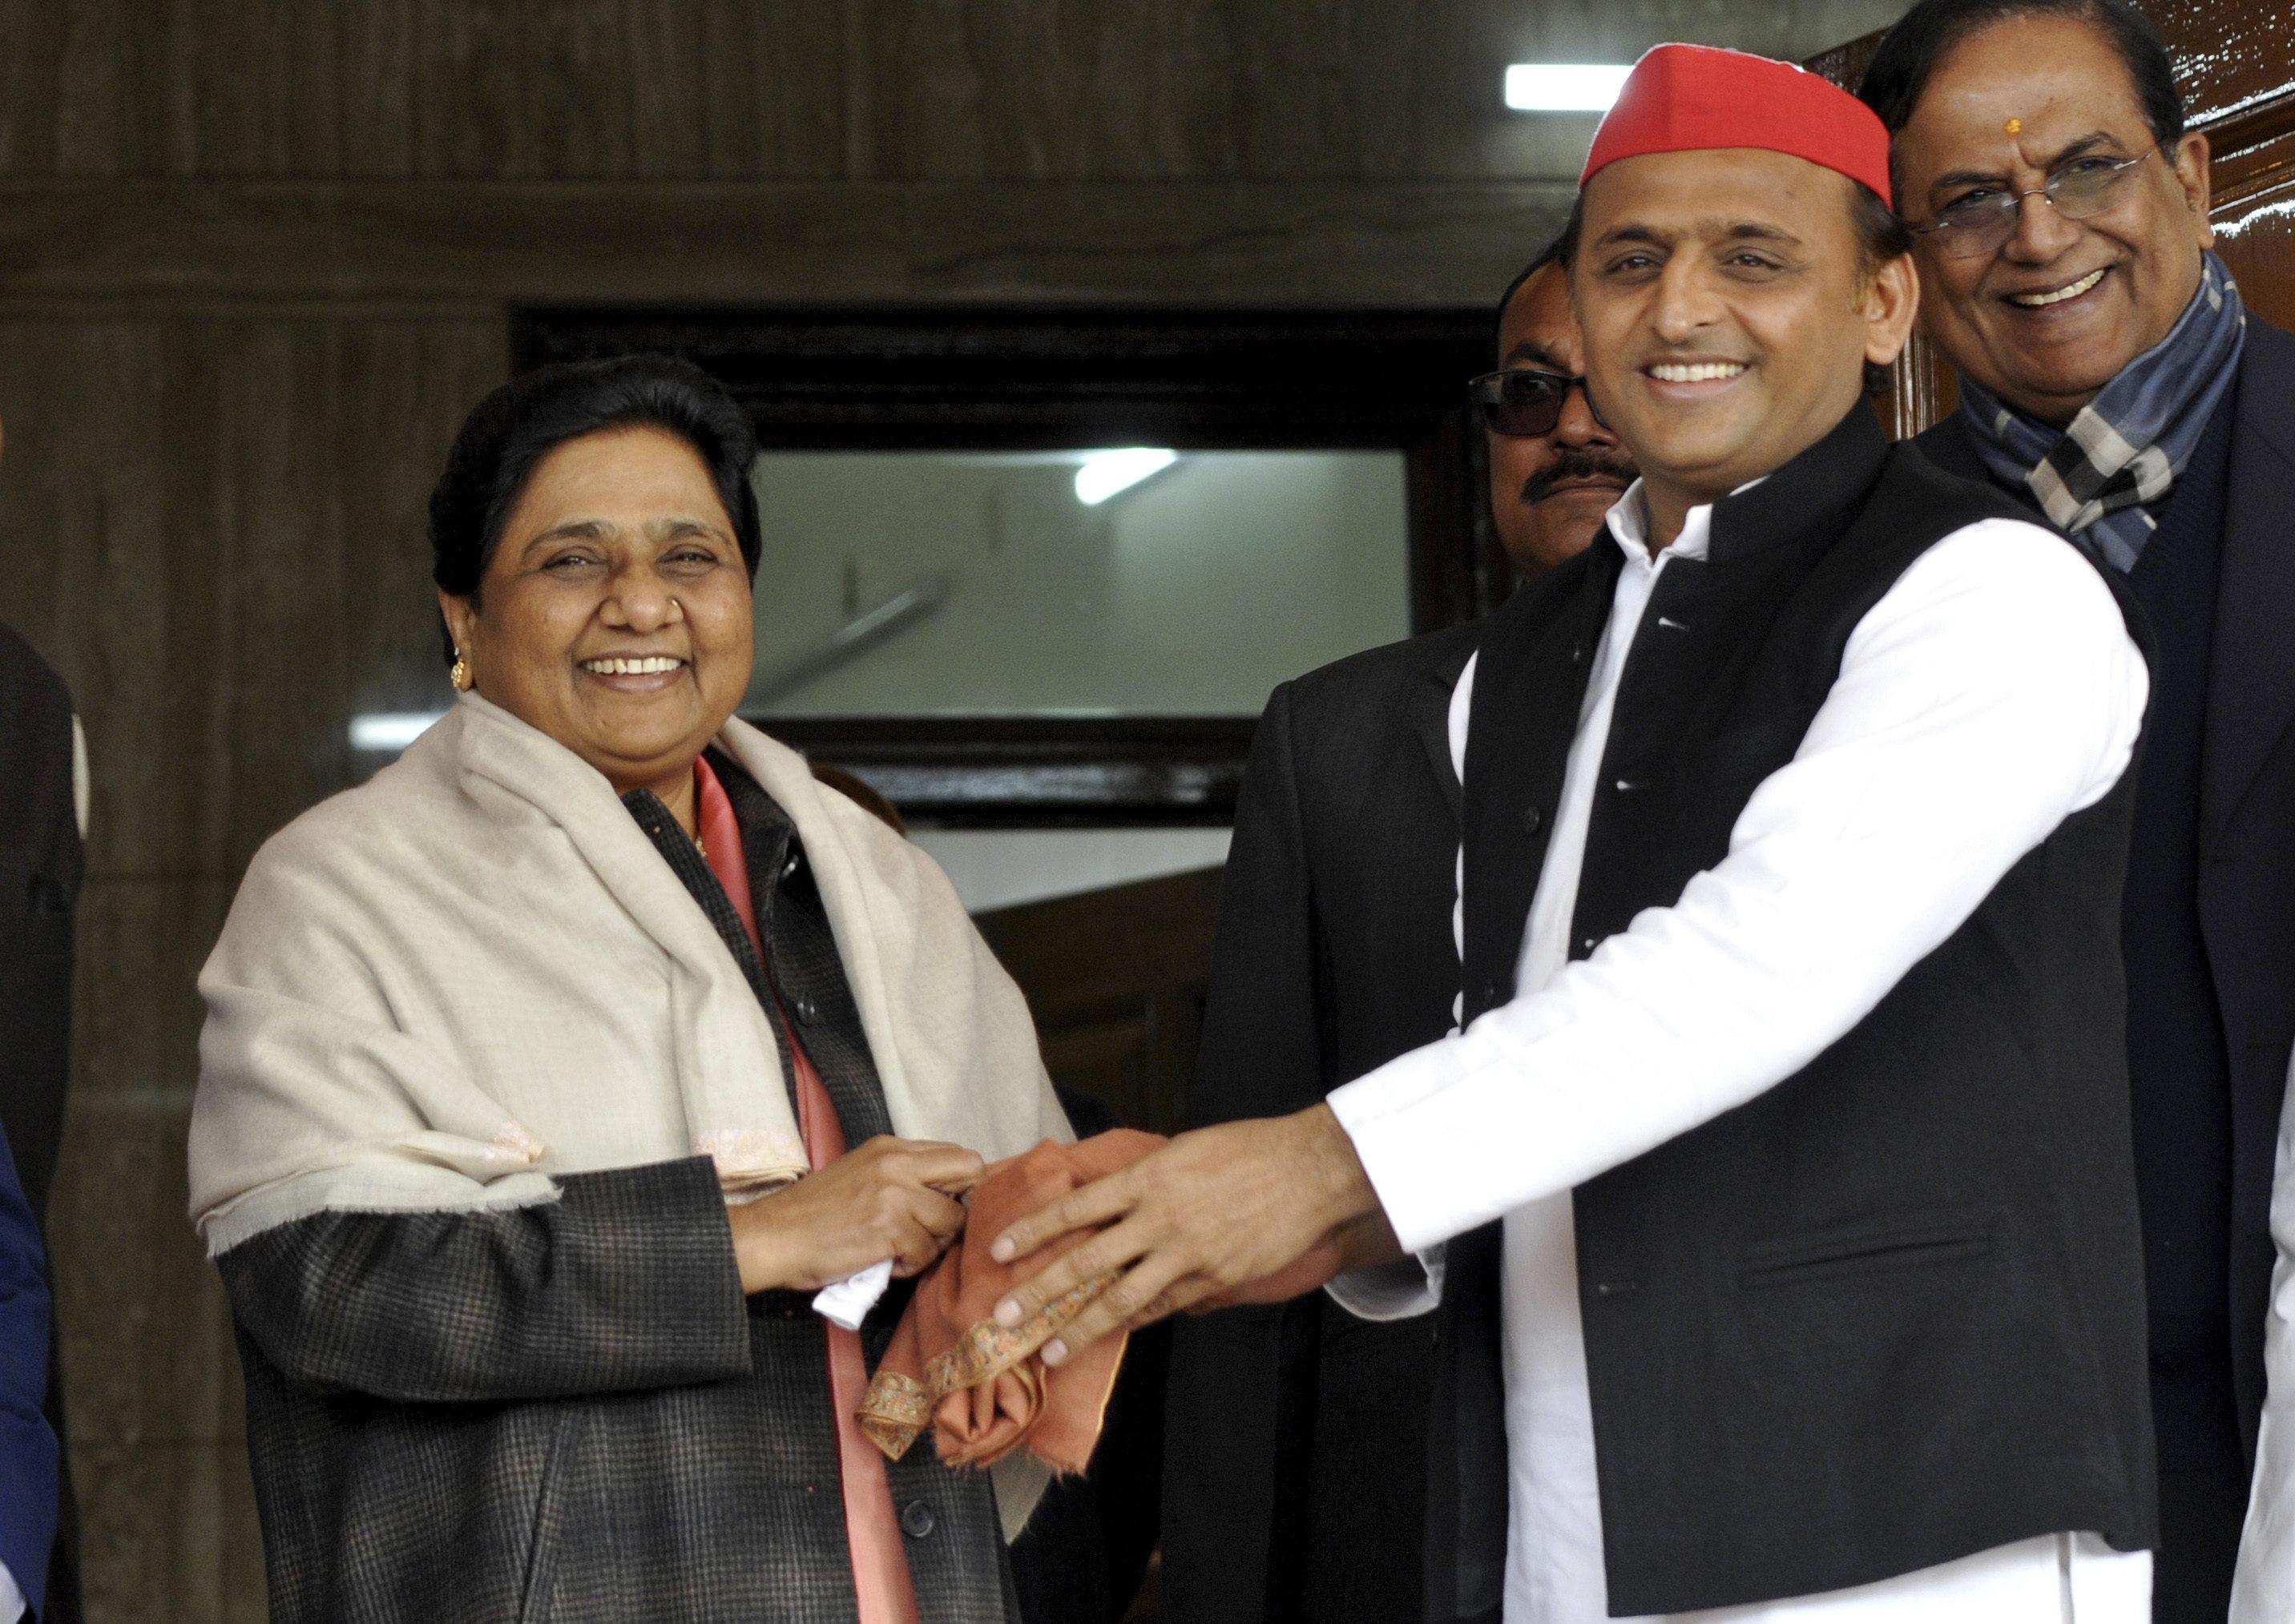 BSP Chief Mayawati Says She Will Not Contest Lok Sabha